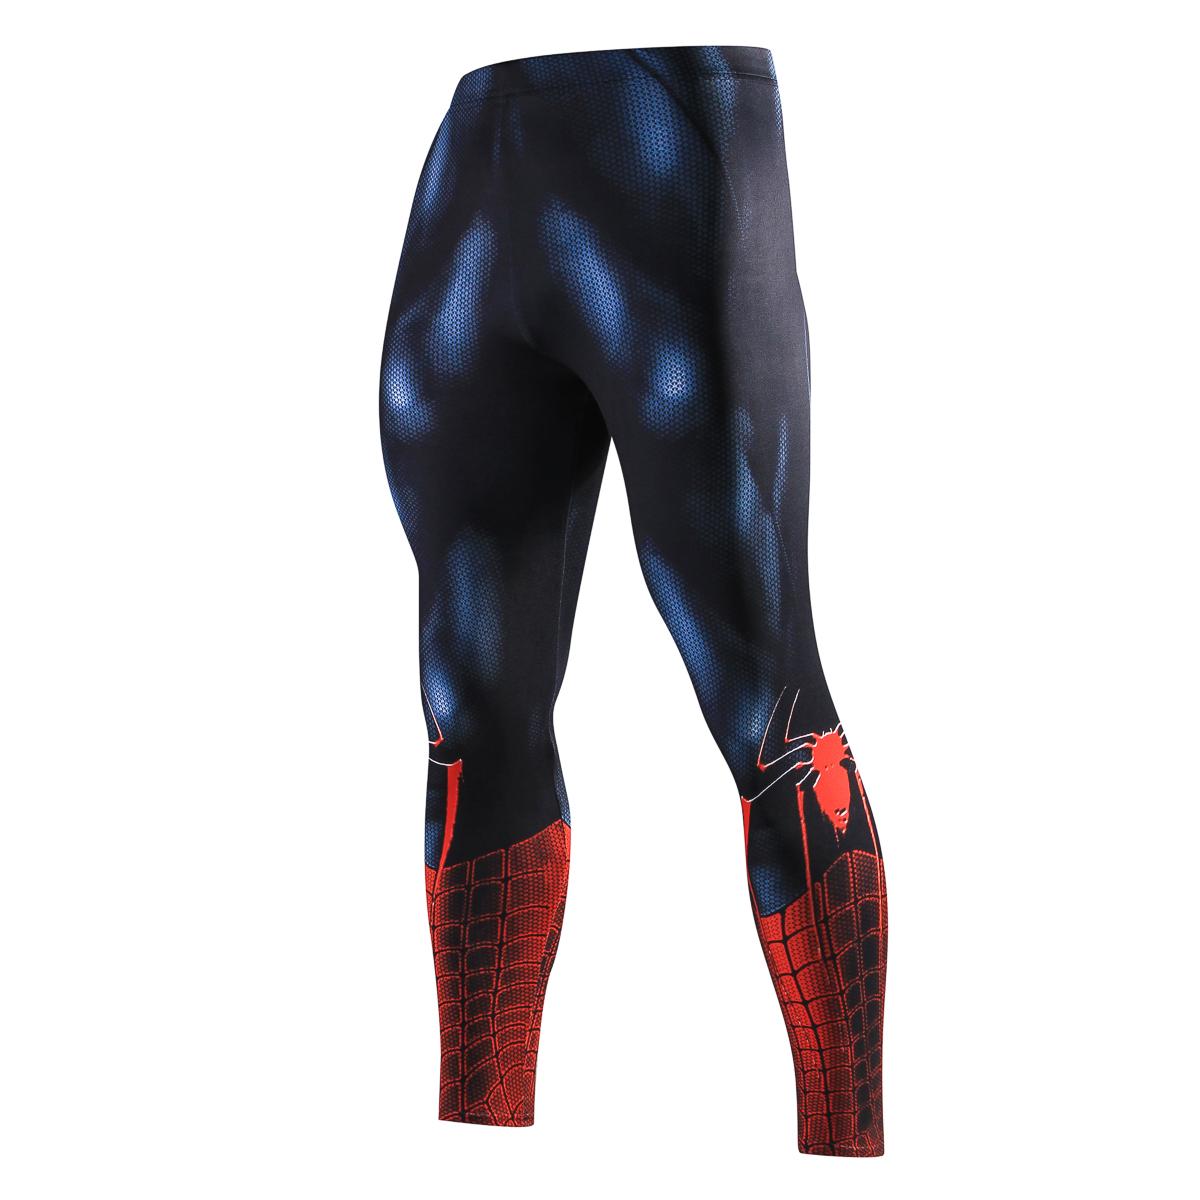 c2bef600e Men Skinny Compression Pants Superman Spiderman Iron Man Batman Leggings  Sweatpants 3D Fitness Bodybuilding Elastic Trousers